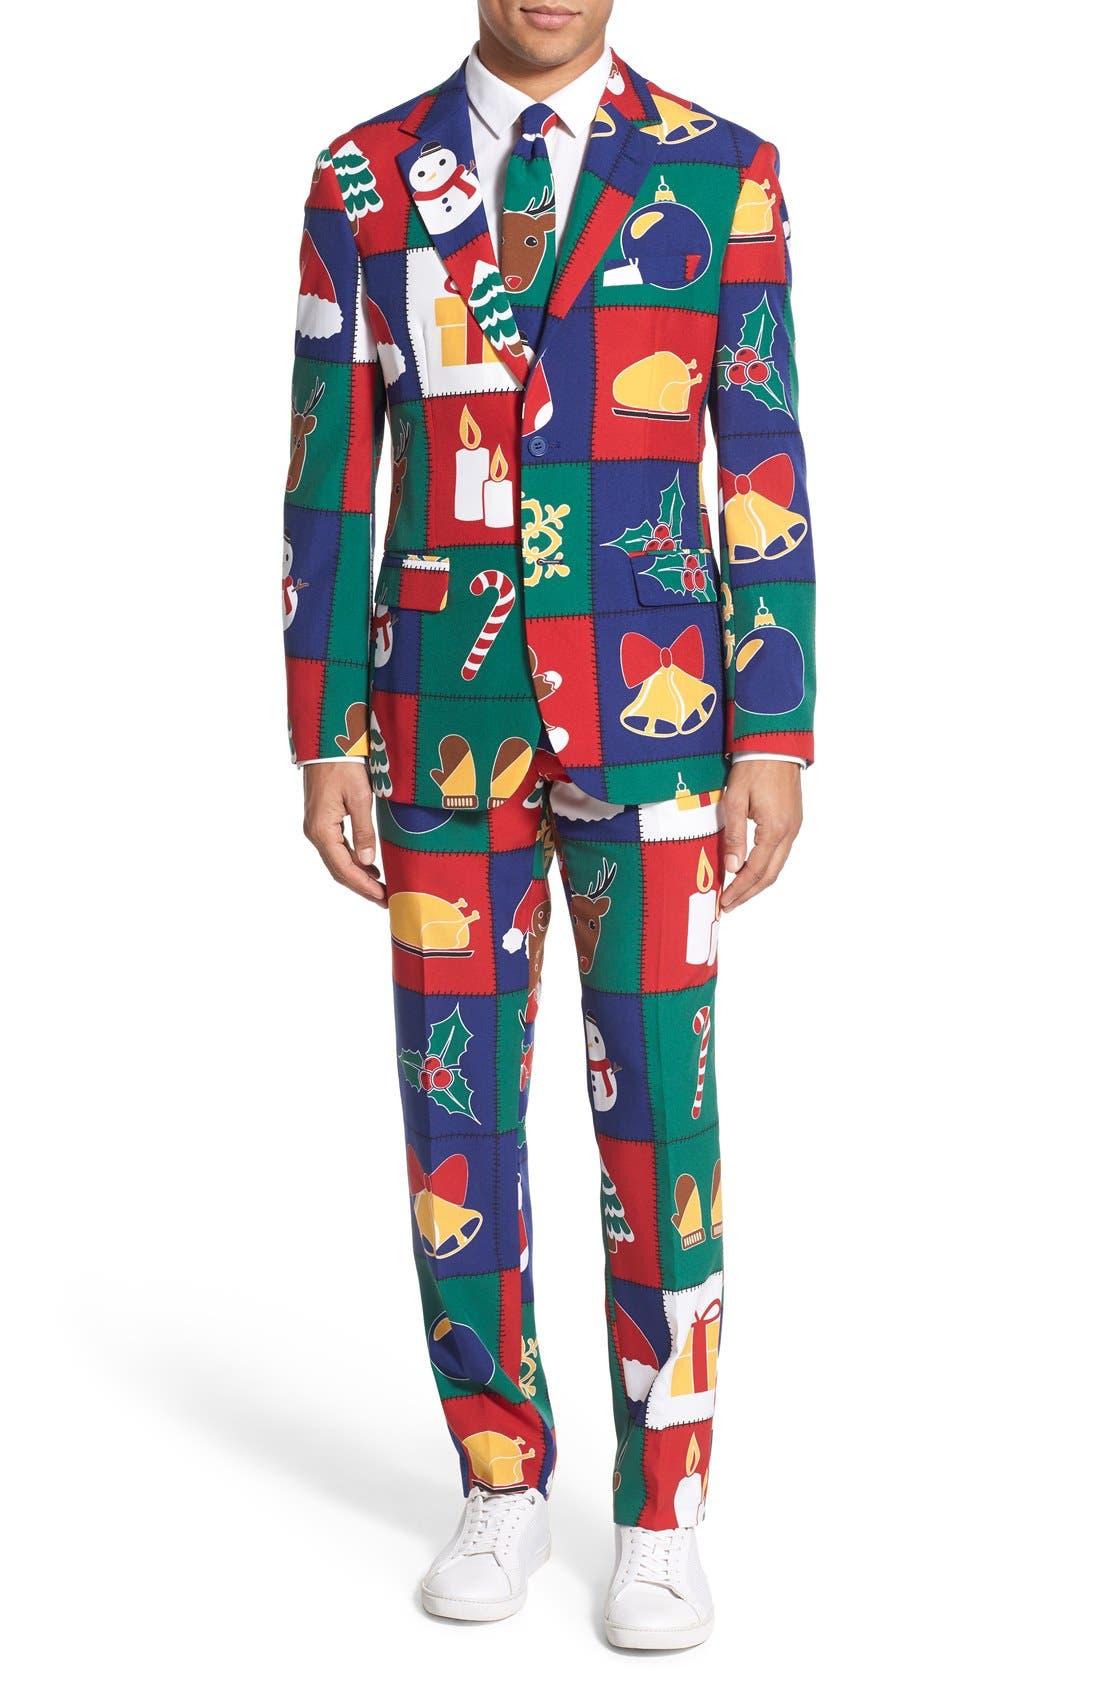 'Quilty Pleasure' Holiday Suit & Tie,                         Main,                         color, Green